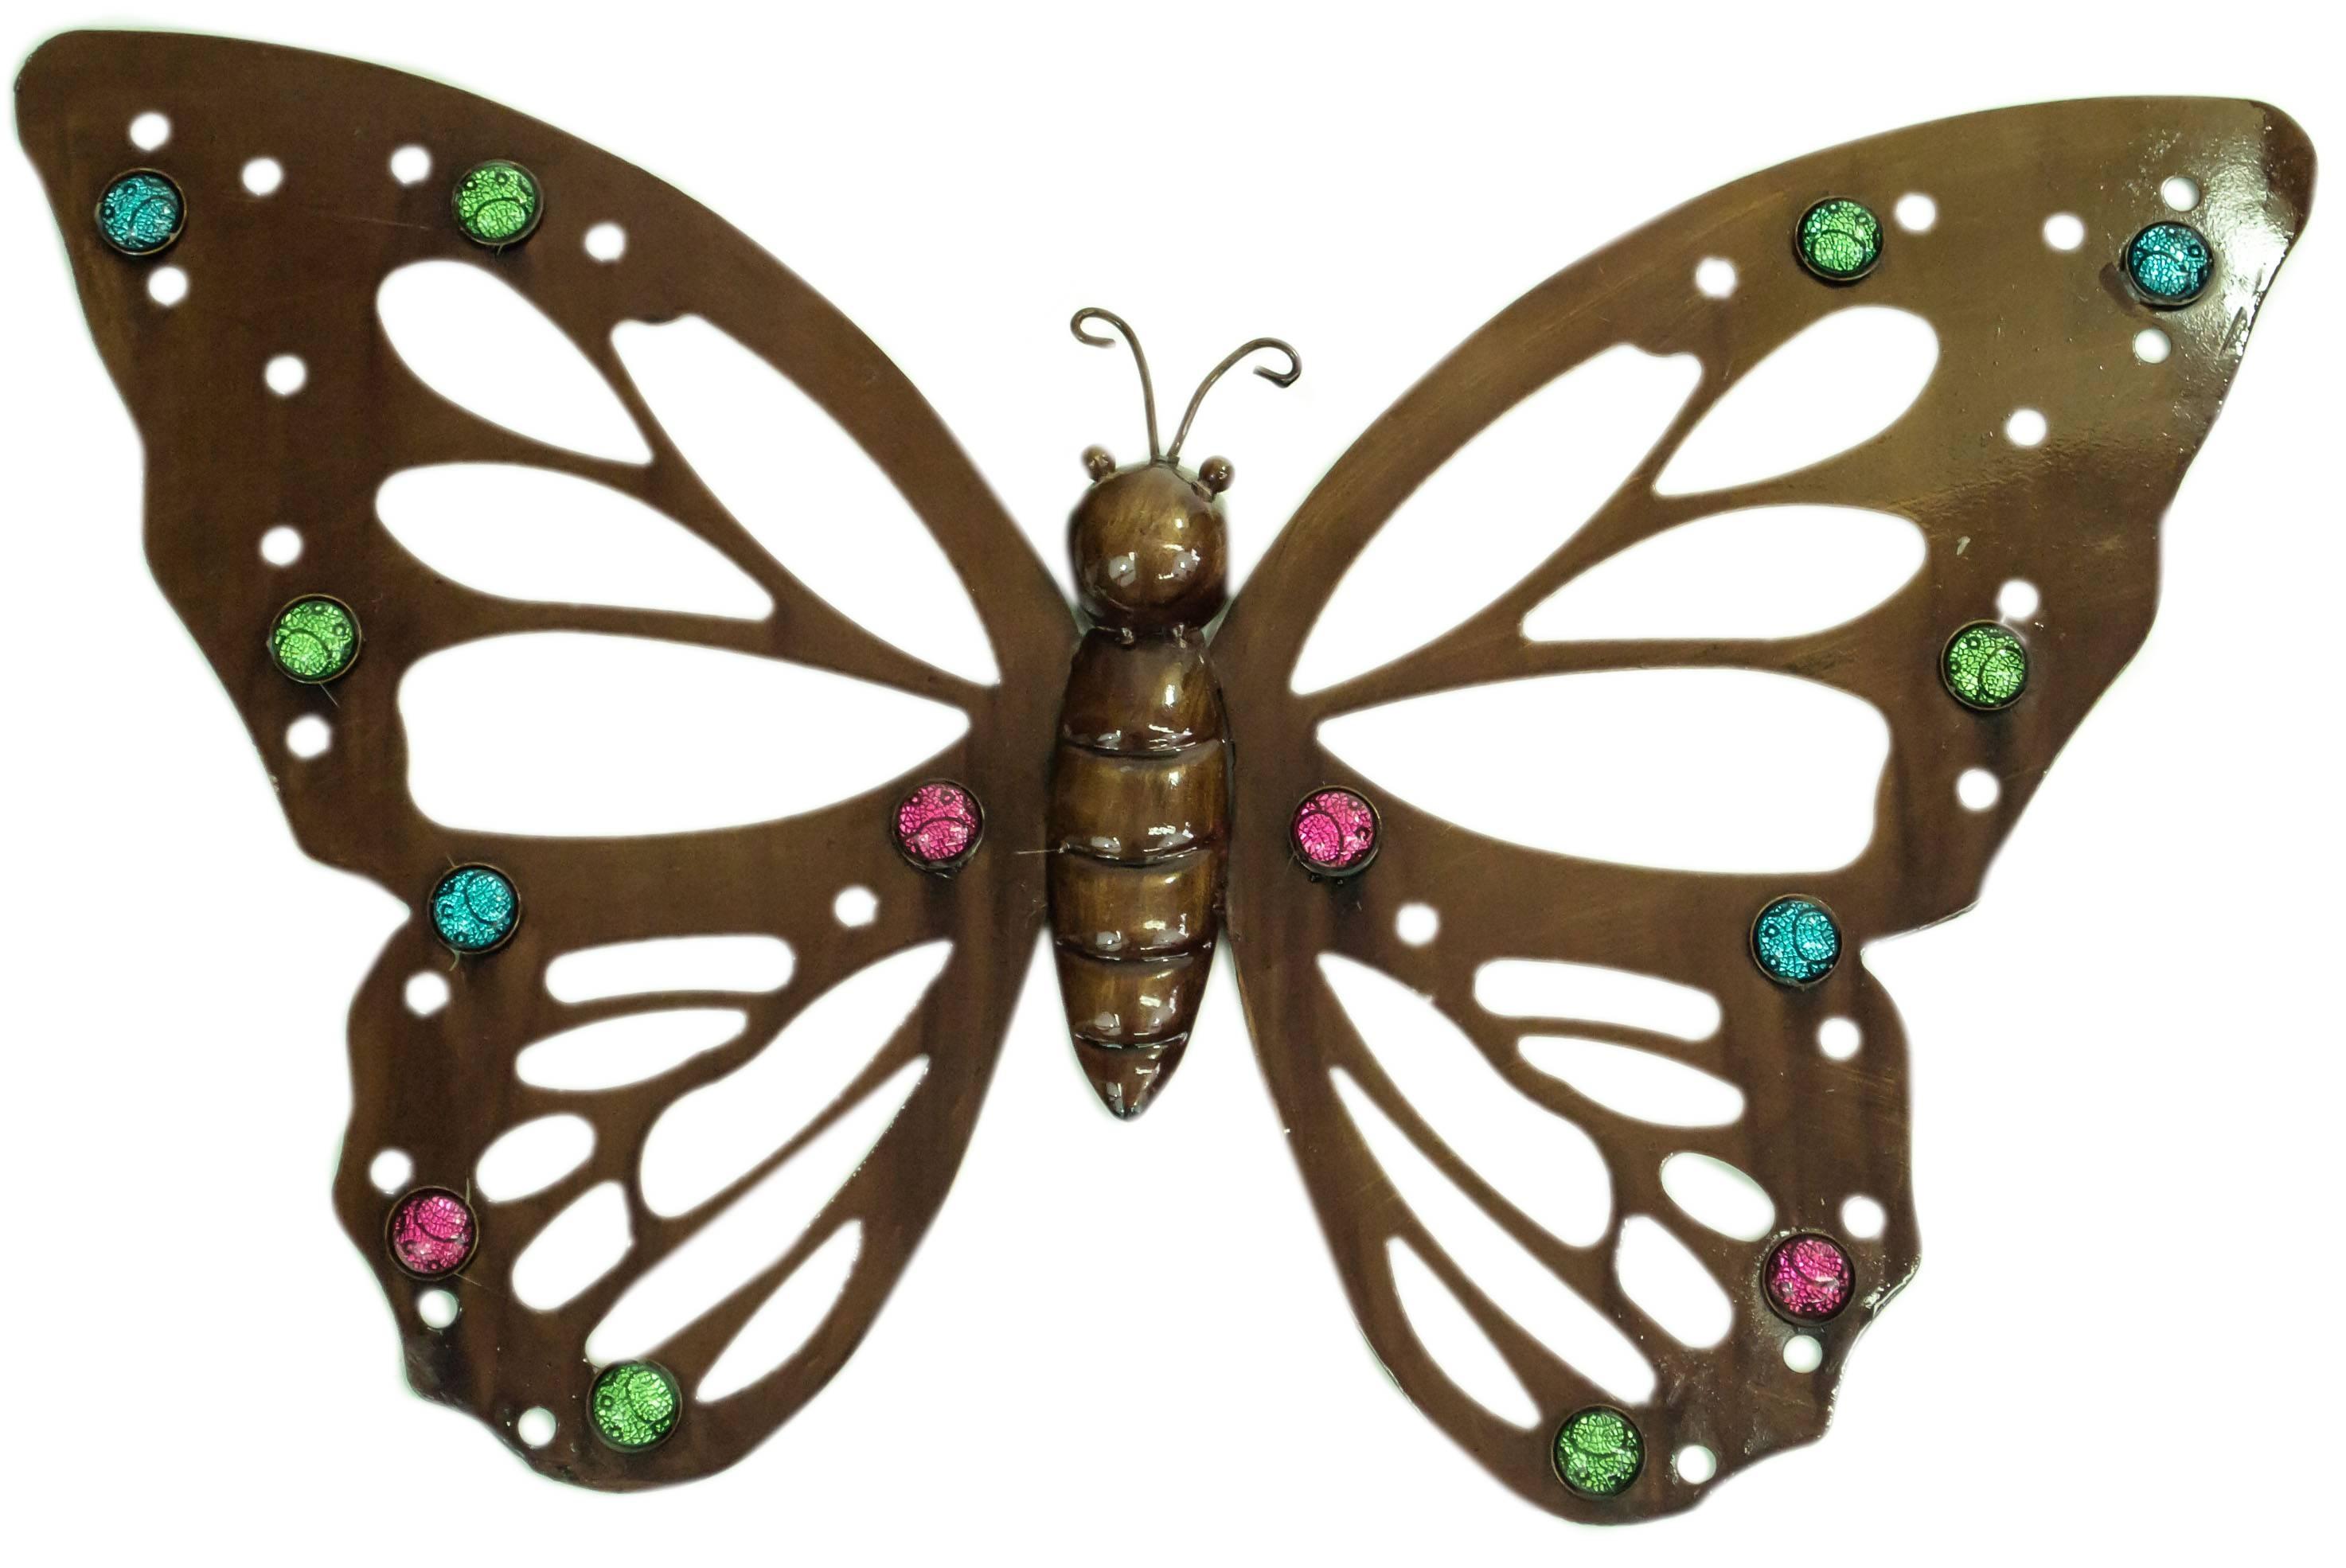 Aluminum Butterfly Wall Art | Wallartideas Inside Latest Butterfly Metal Wall Art (View 18 of 20)